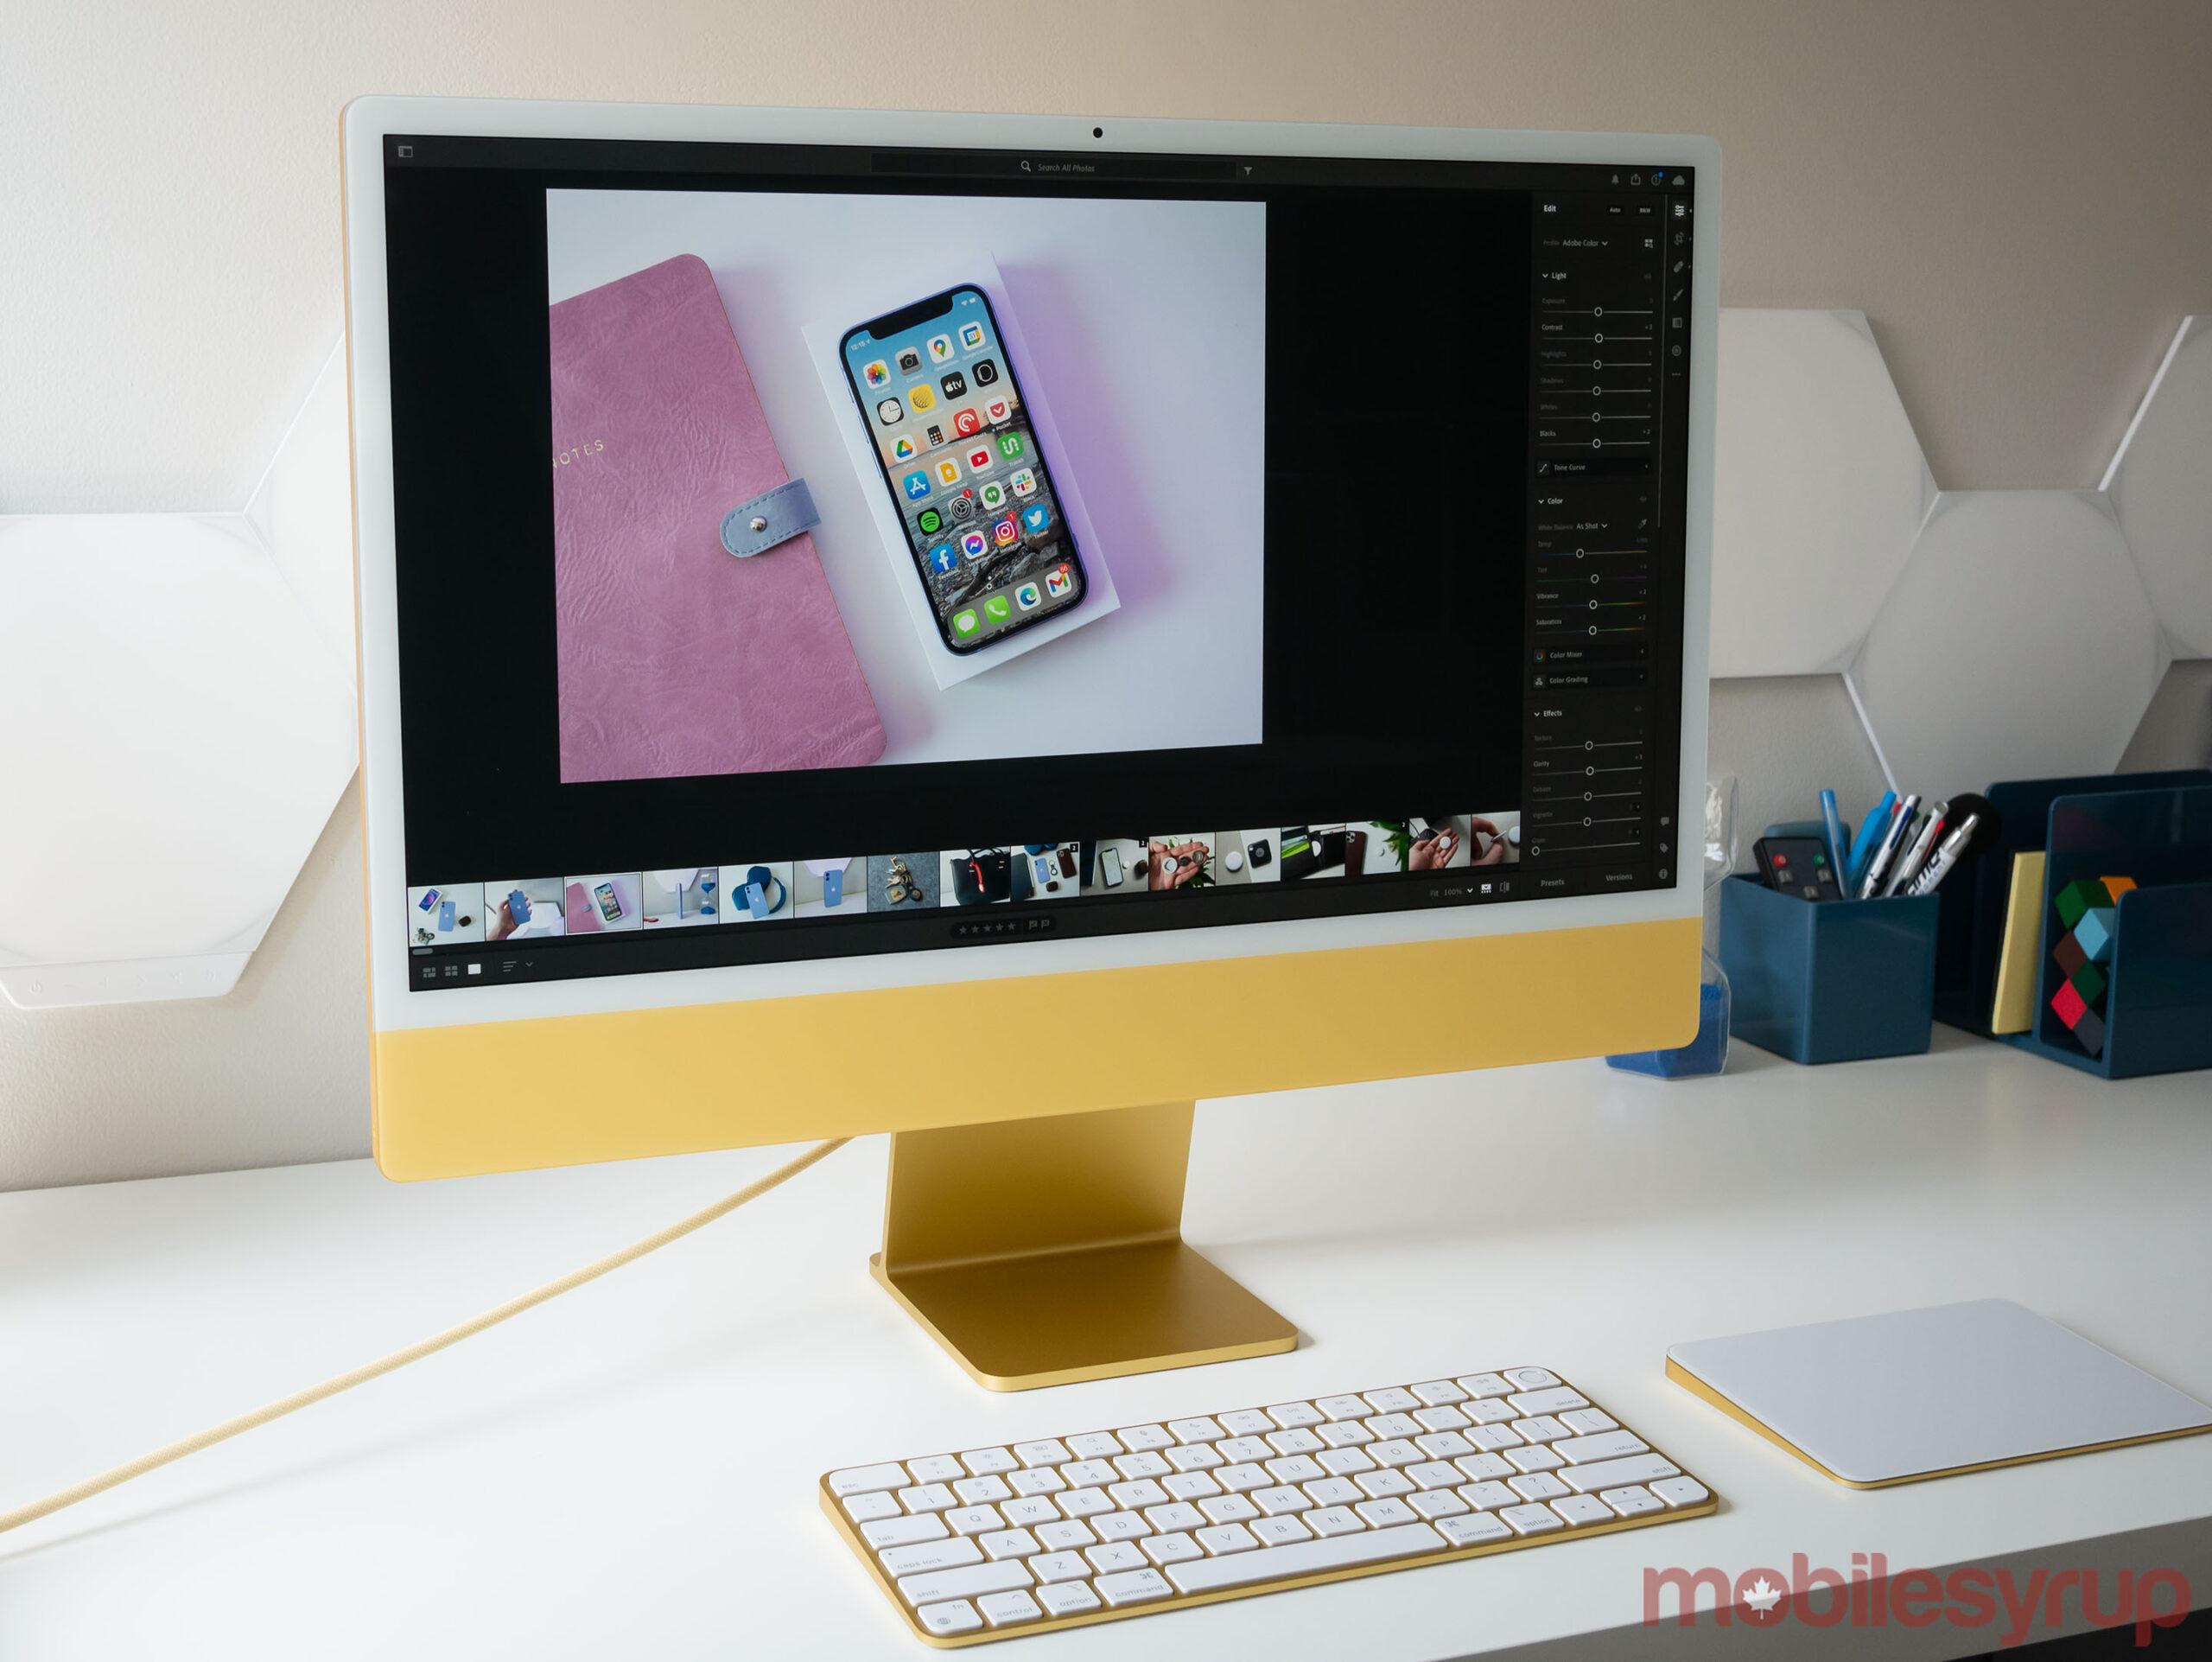 24-inch iMac 2021 Lightroom CC